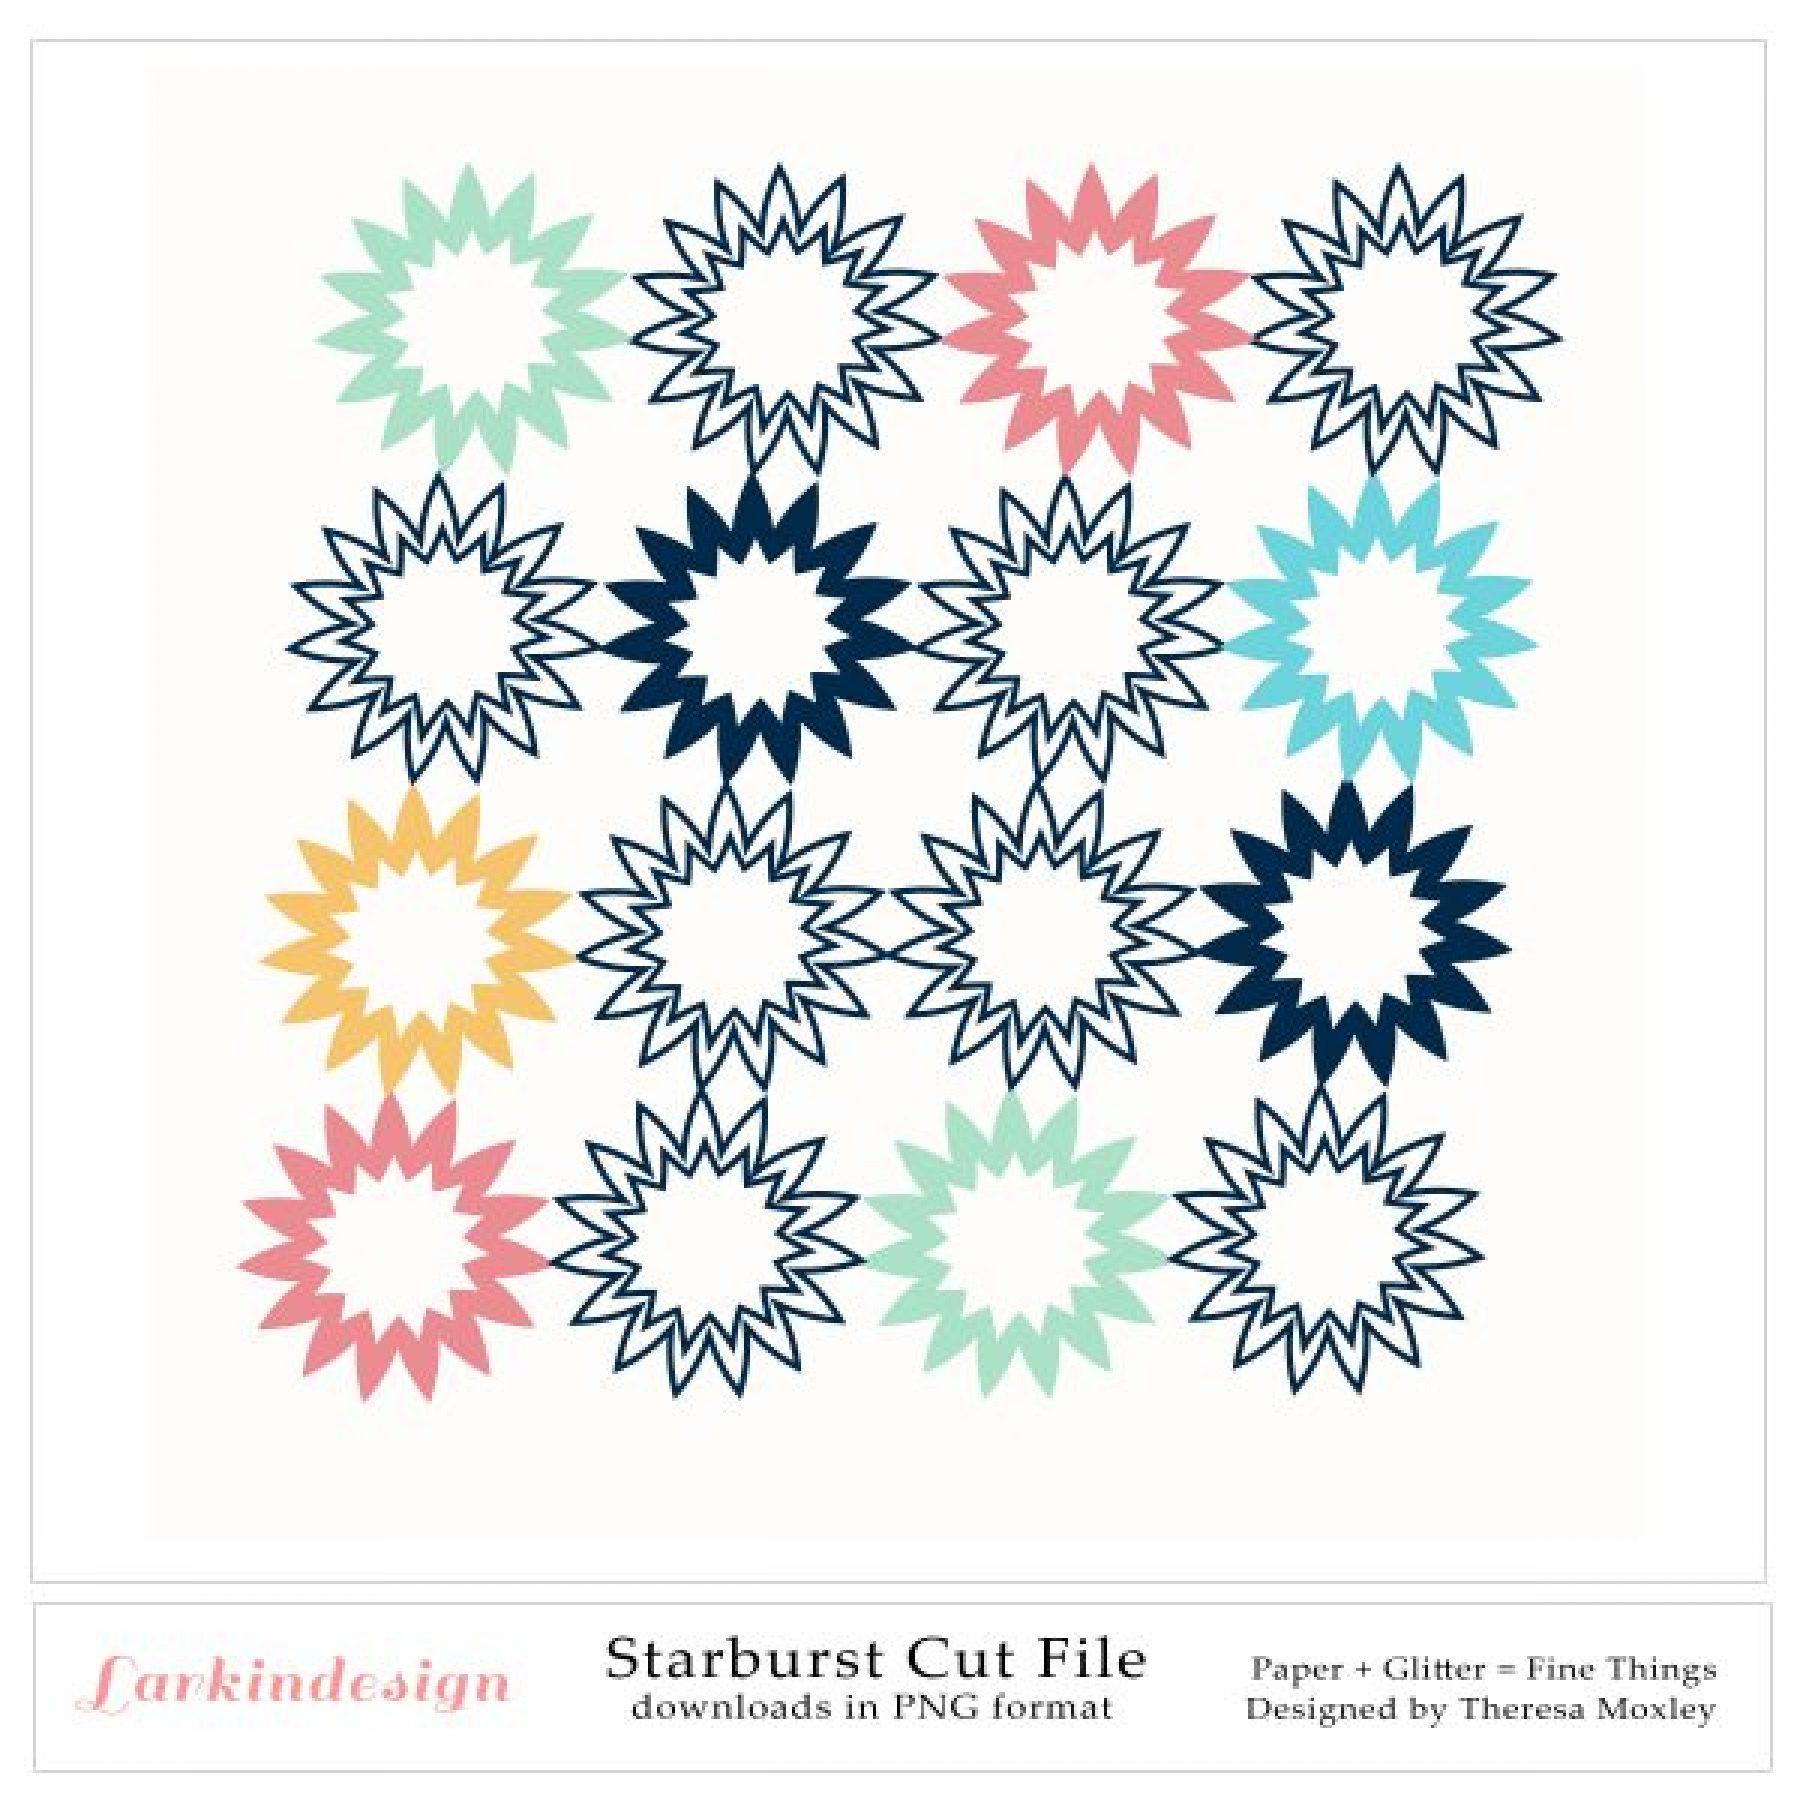 Starburst Digital Cut File